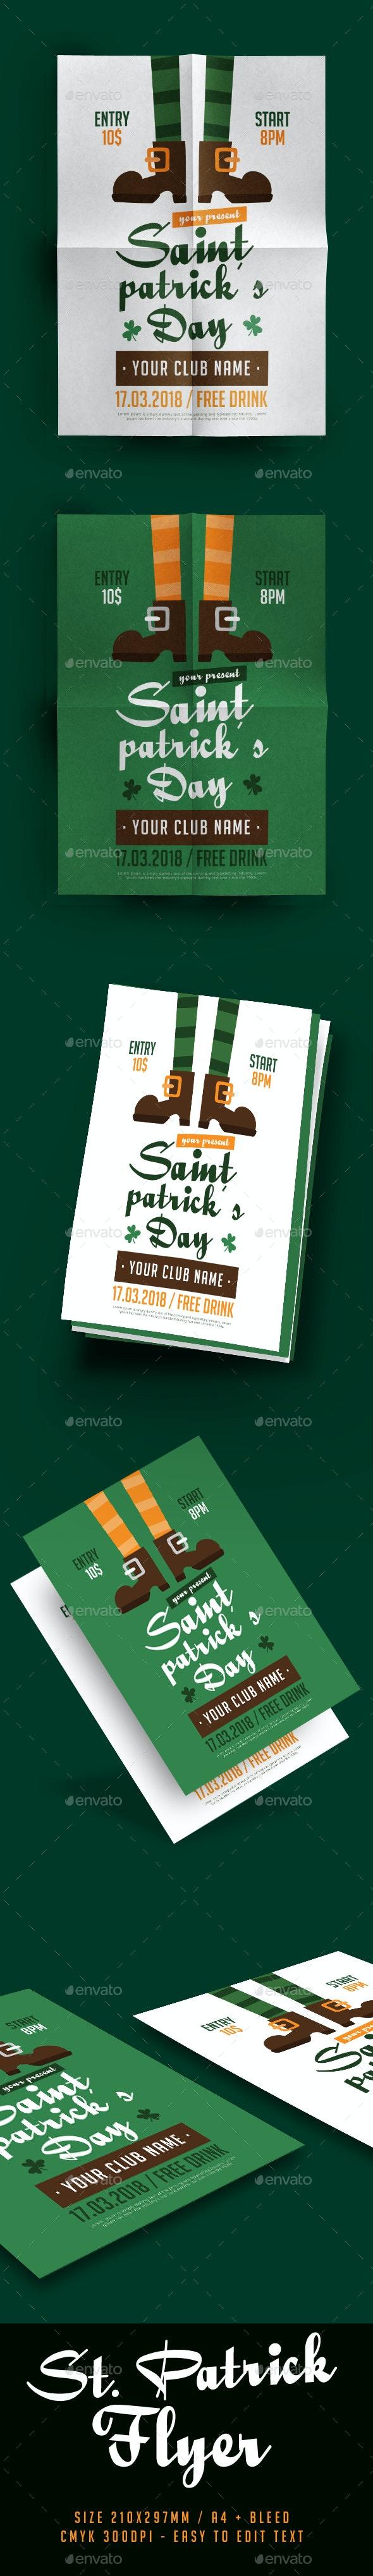 Saint Patrick's Day Flyer - Events Flyers